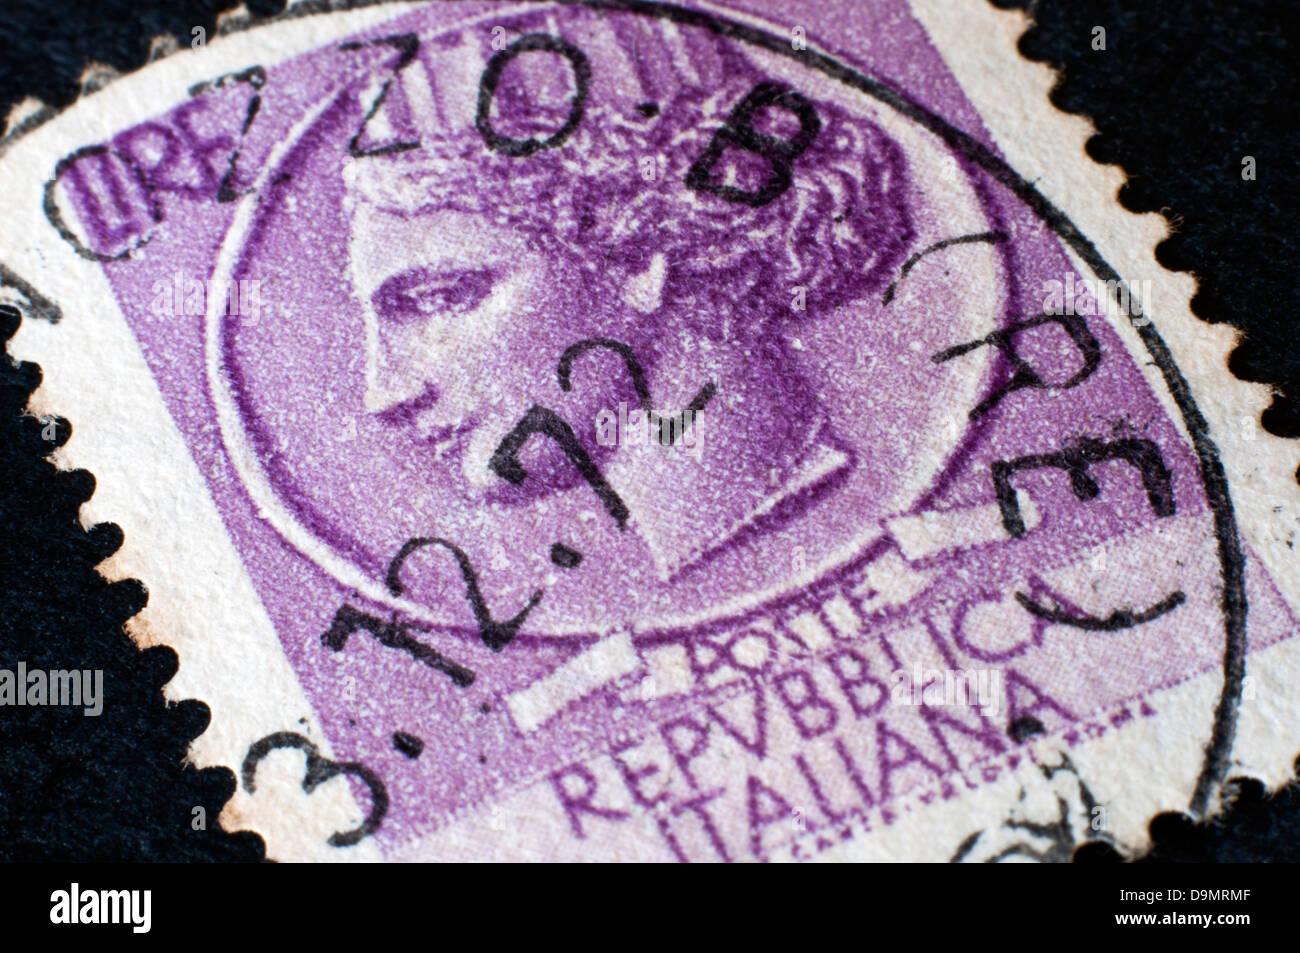 old italian postage stamp in studio setting - Stock Image